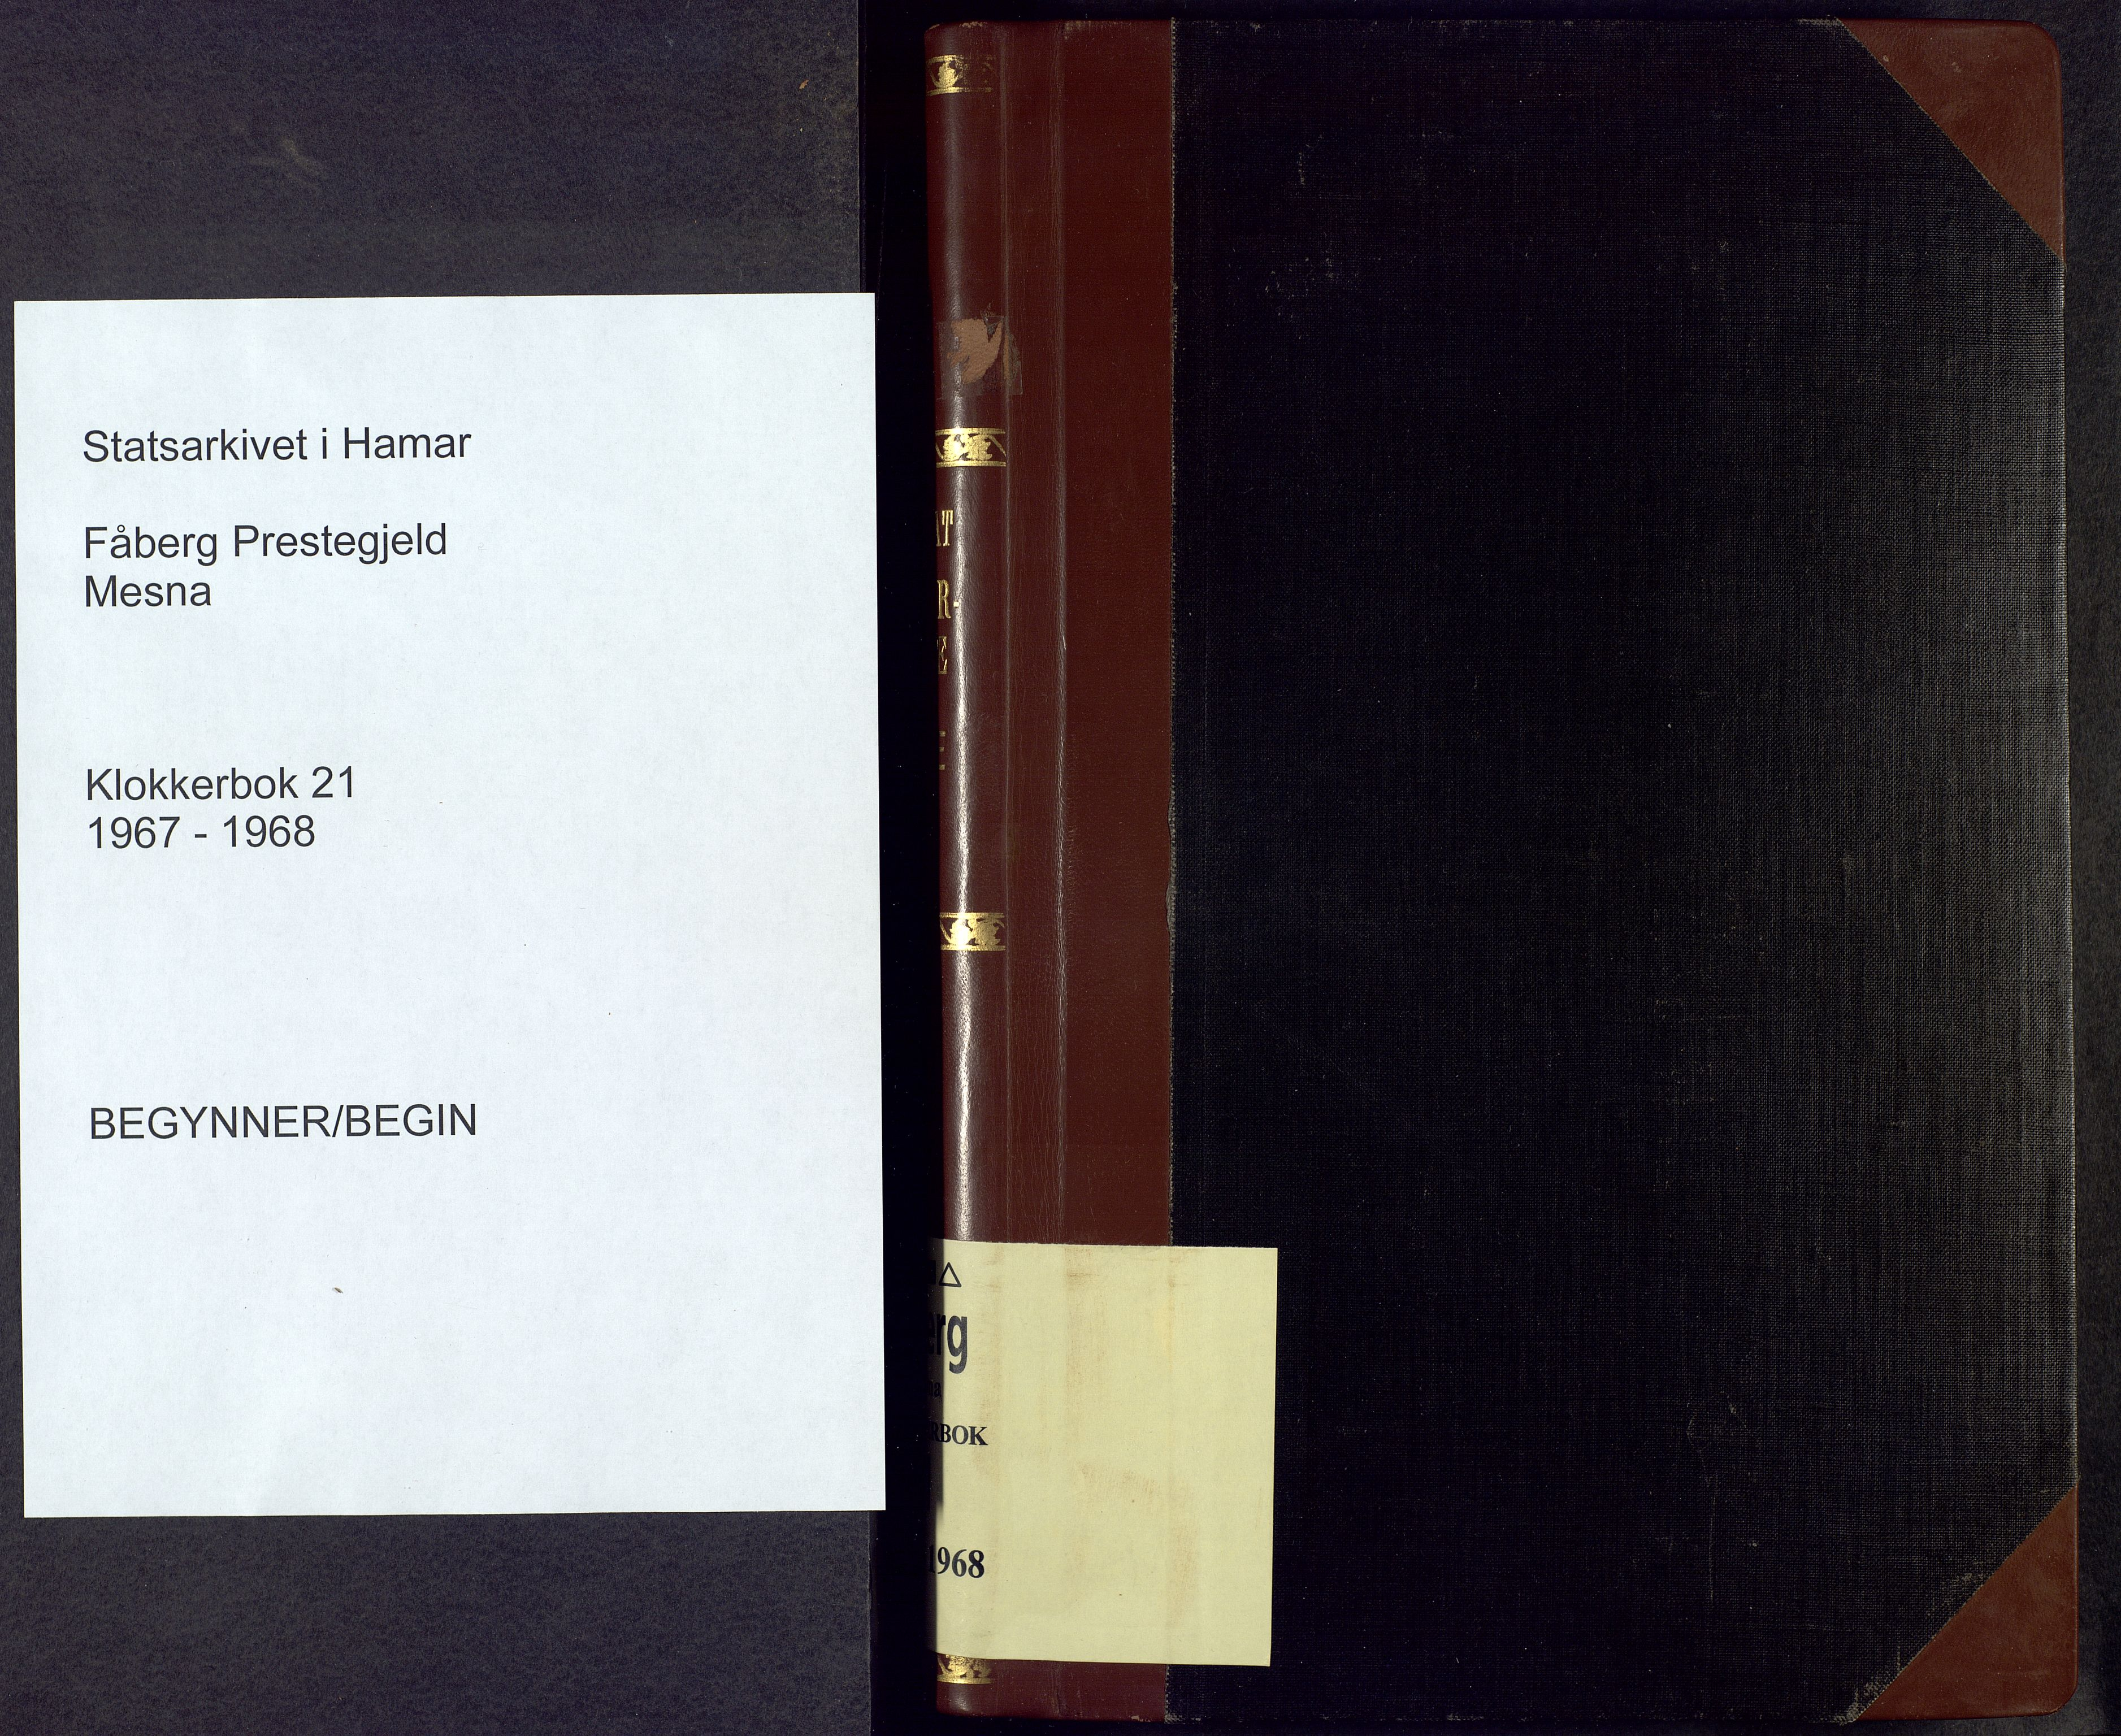 SAH, Fåberg prestekontor, H/Ha/Hab/L0021: Klokkerbok nr. 21, 1967-1968